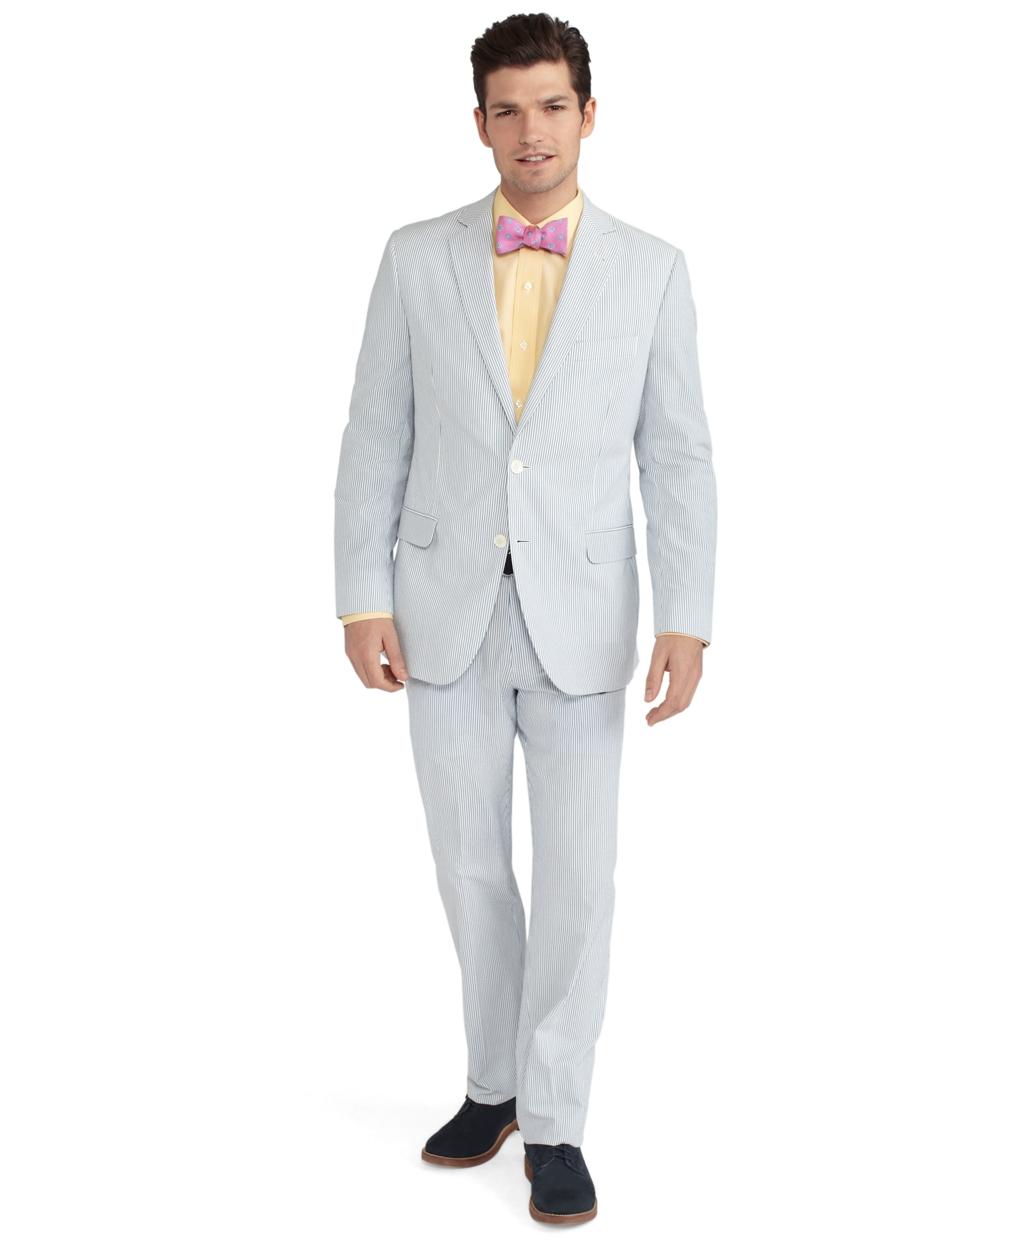 Lyst - Brooks Brothers Seersucker Fitzgerald Fit Suit in ...